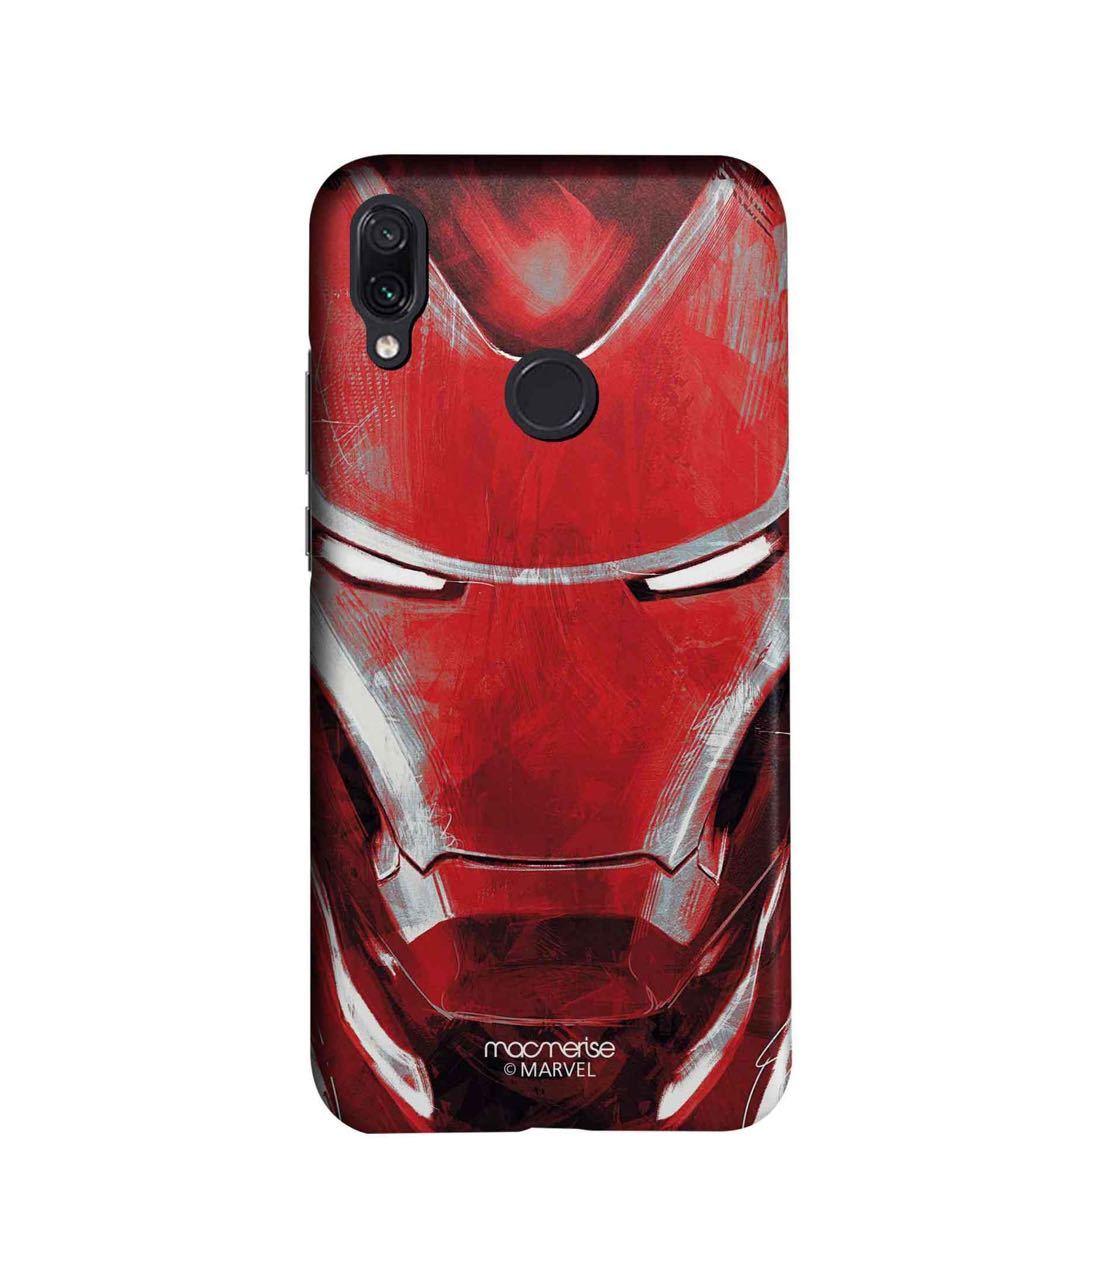 Charcoal Art Iron man - Sleek Phone Case for Xiaomi Redmi Note 7